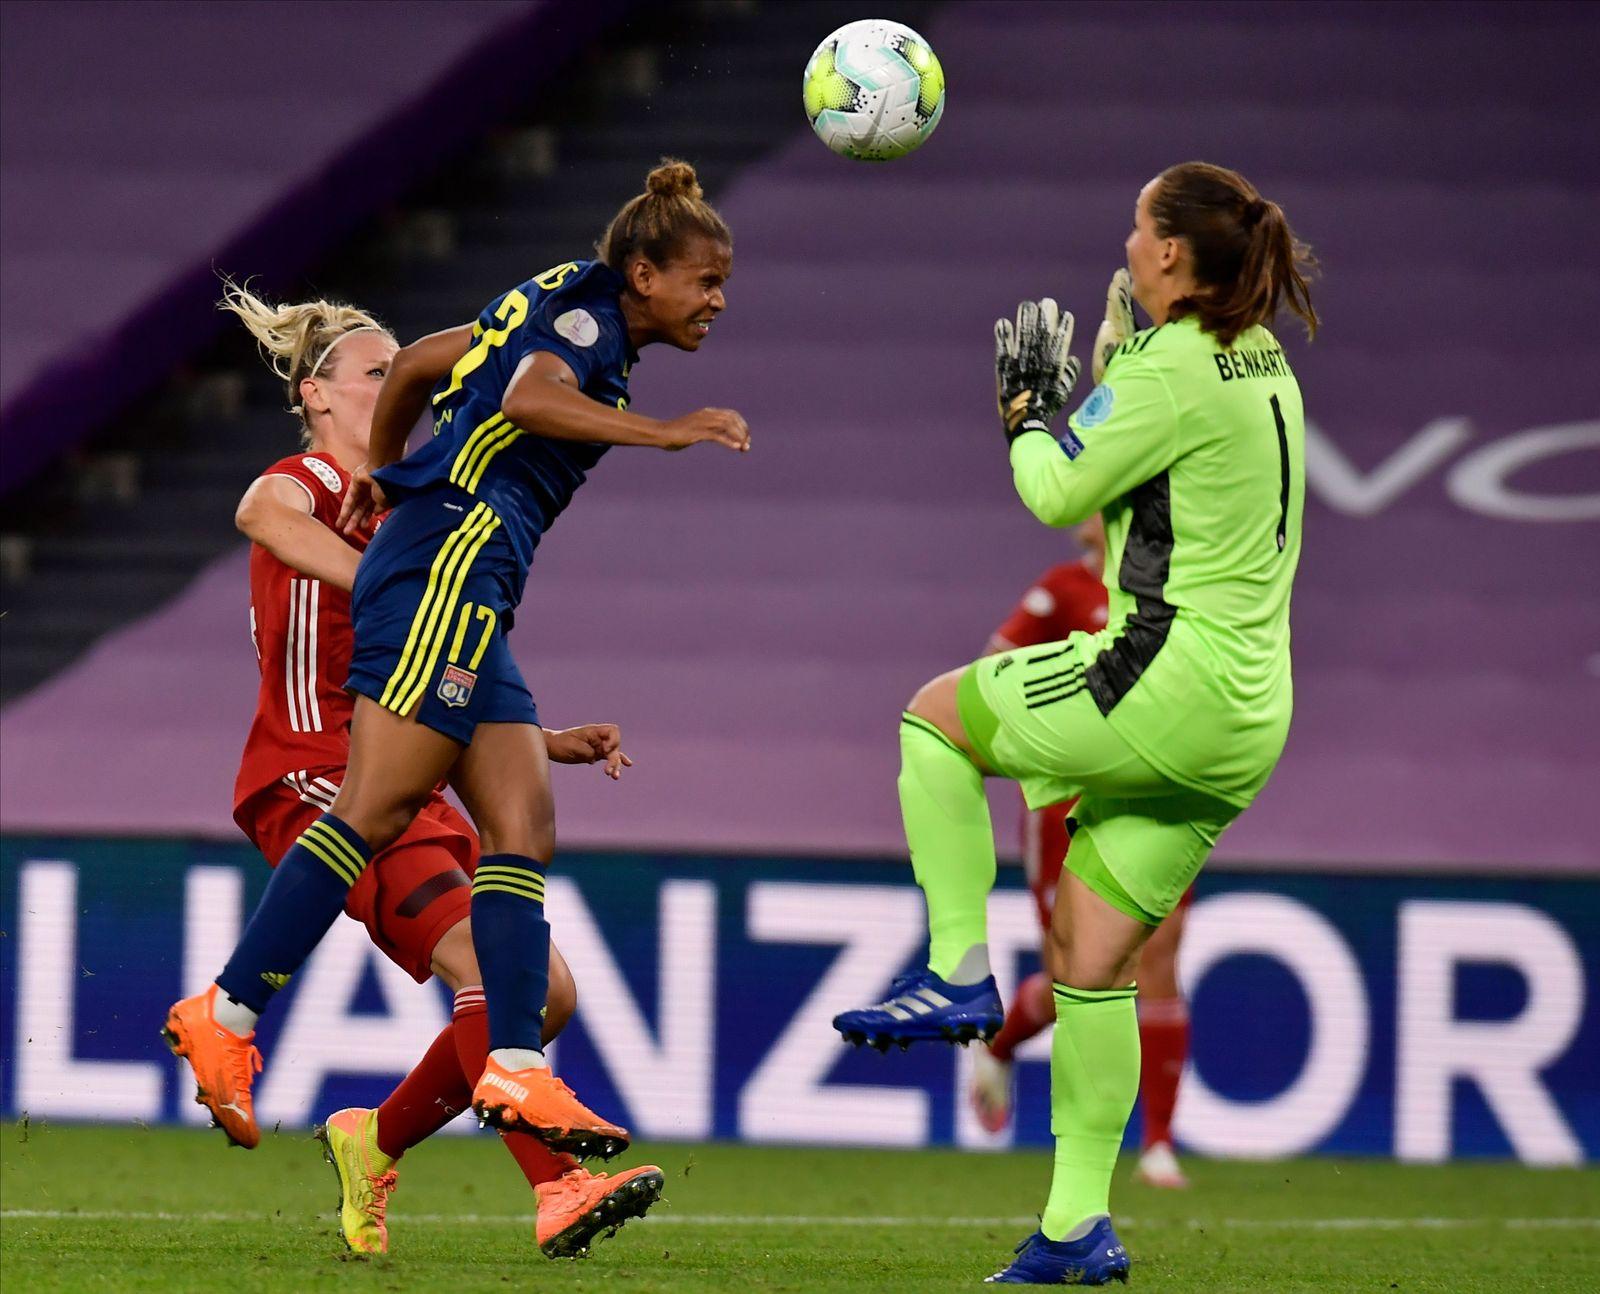 Olympique Lyon vs Bayern Munich, Bilbao, Spain - 22 Aug 2020